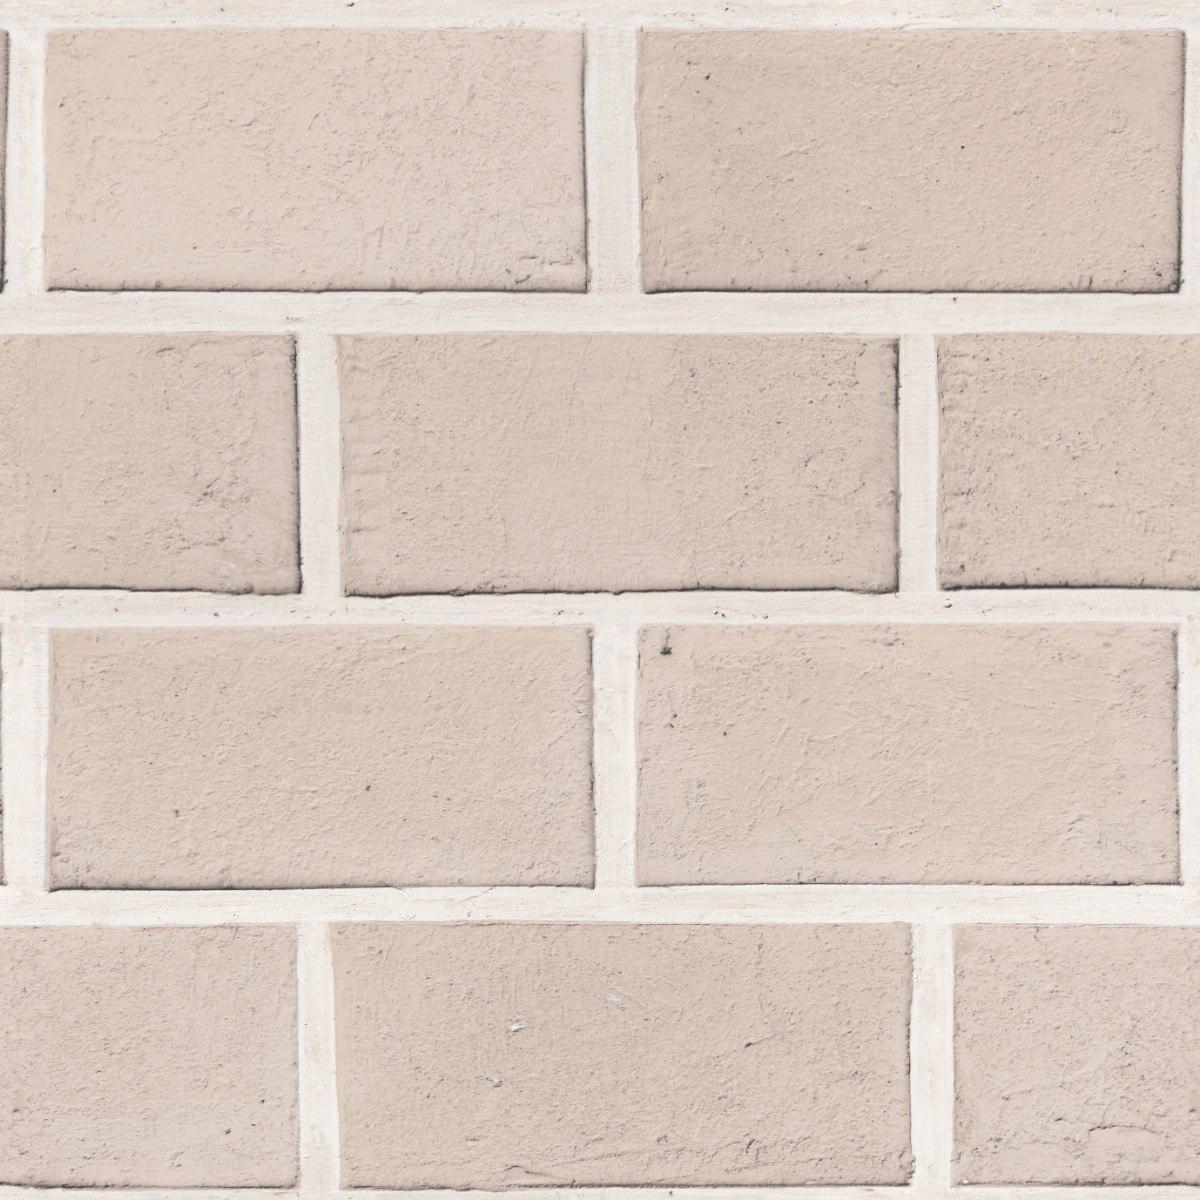 32dd837b8 papel de parede sala bloco tijolinho a vista bege 7rolos 3mt. Carregando  zoom.